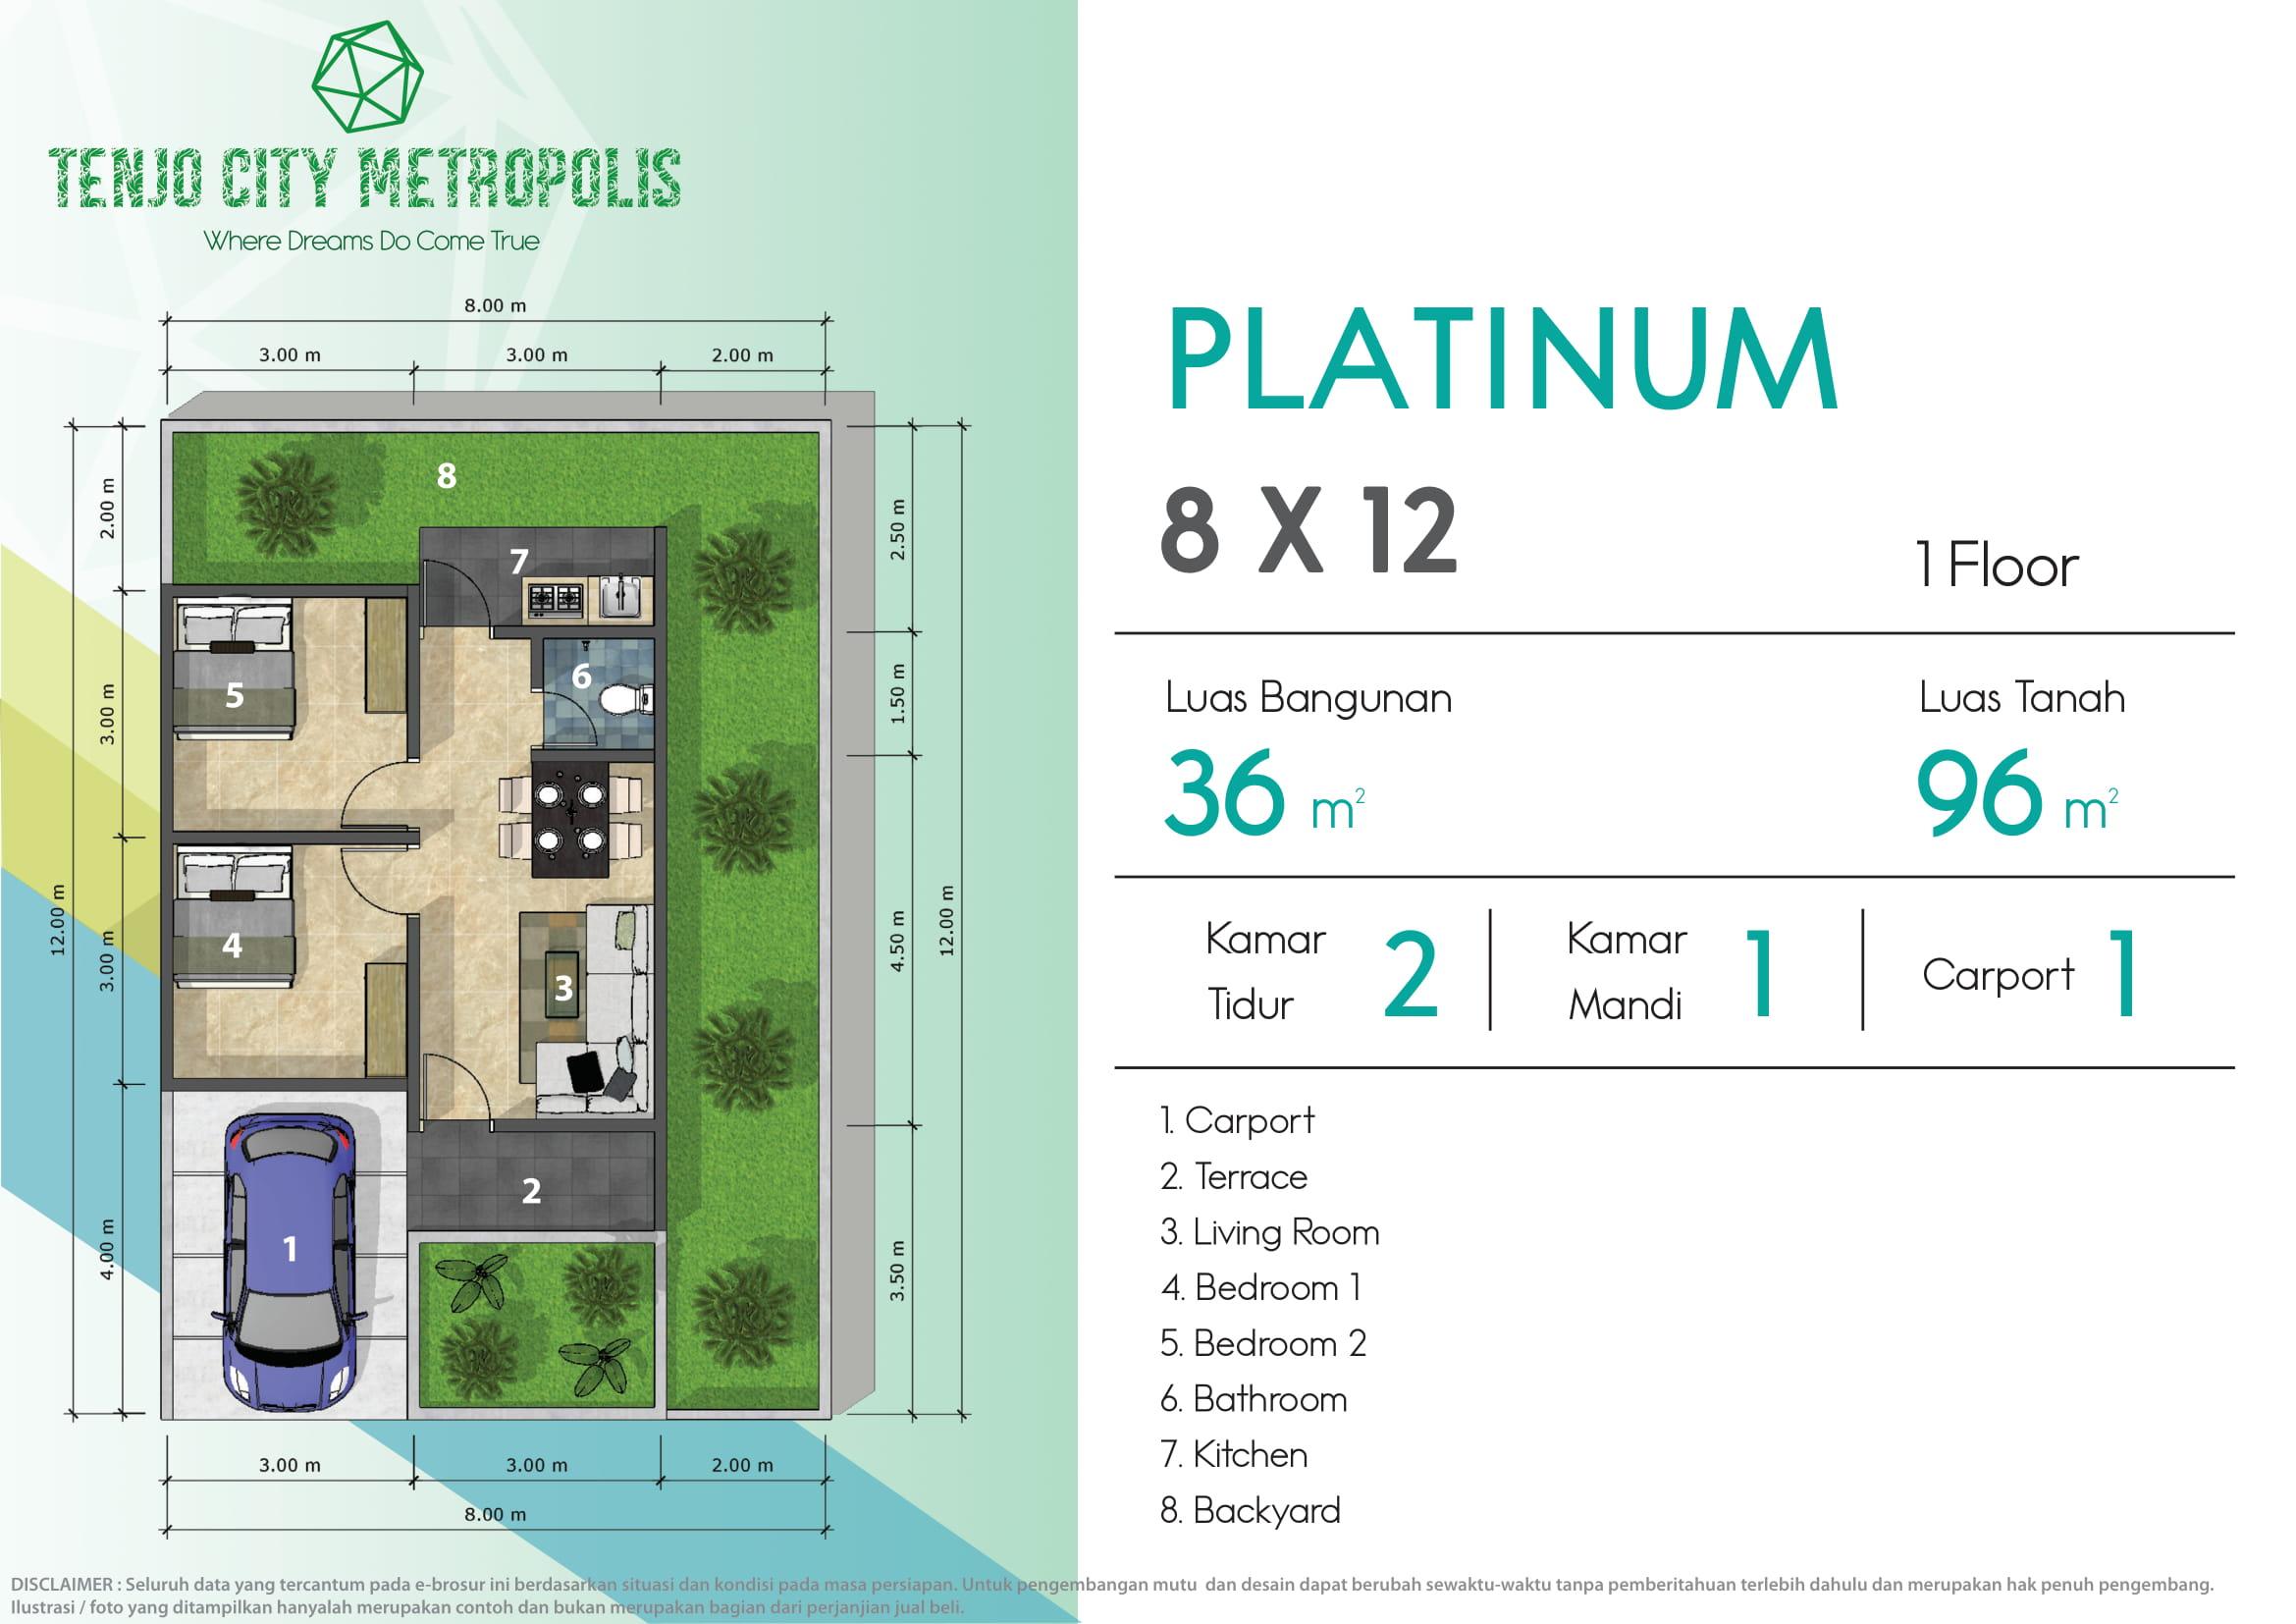 Image - PLATINUM 8 X 12 - Property Millennial - Cluster - Rumah - Apartemen - Ruko